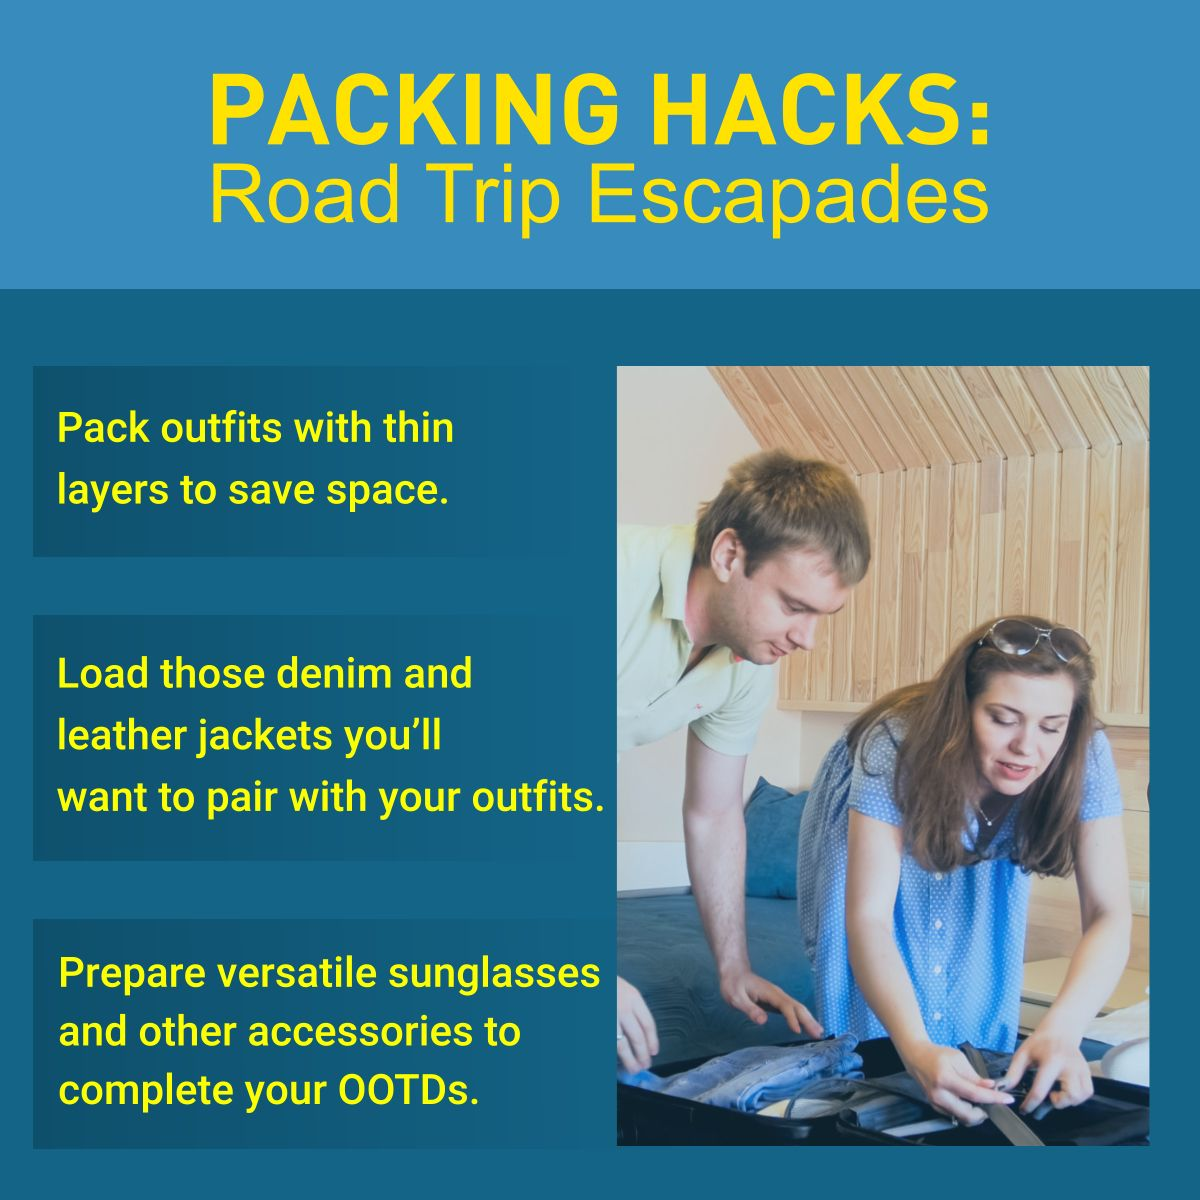 Packing Hacks Road Trip Escapades Outfits Denim Ootd